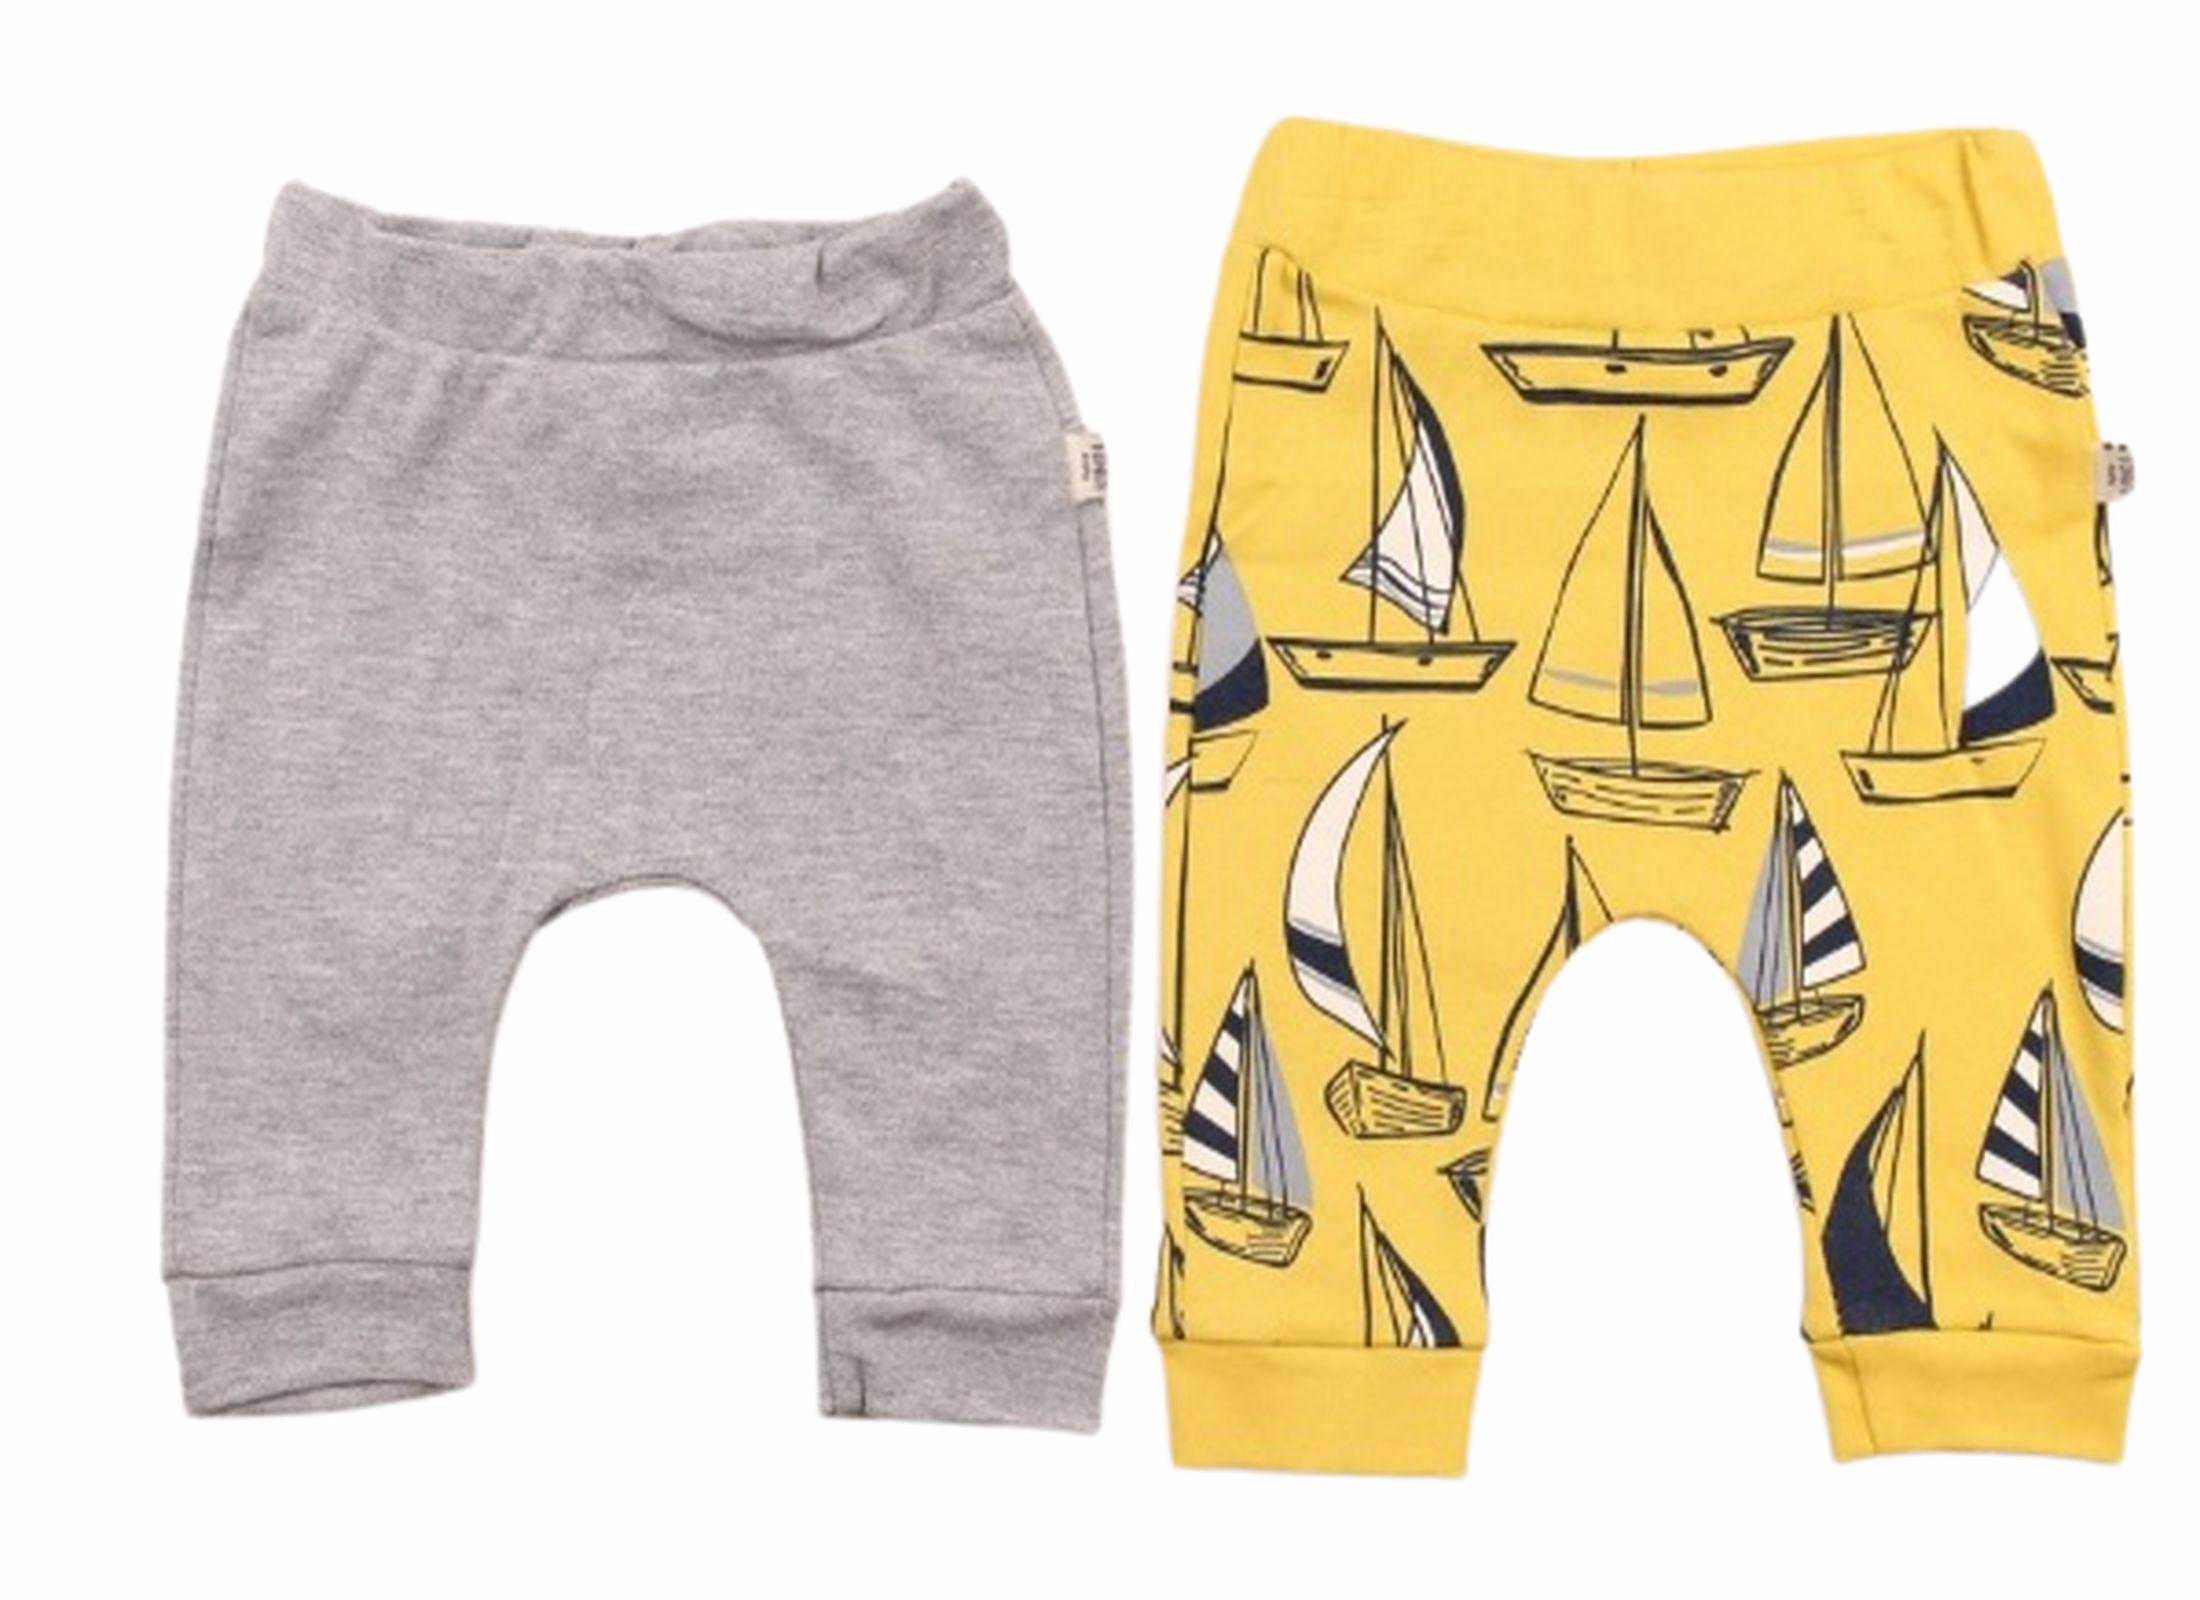 Tongs Baby Yelkenli Gemi Baskılı Penye Pijama Alt 2'li Set